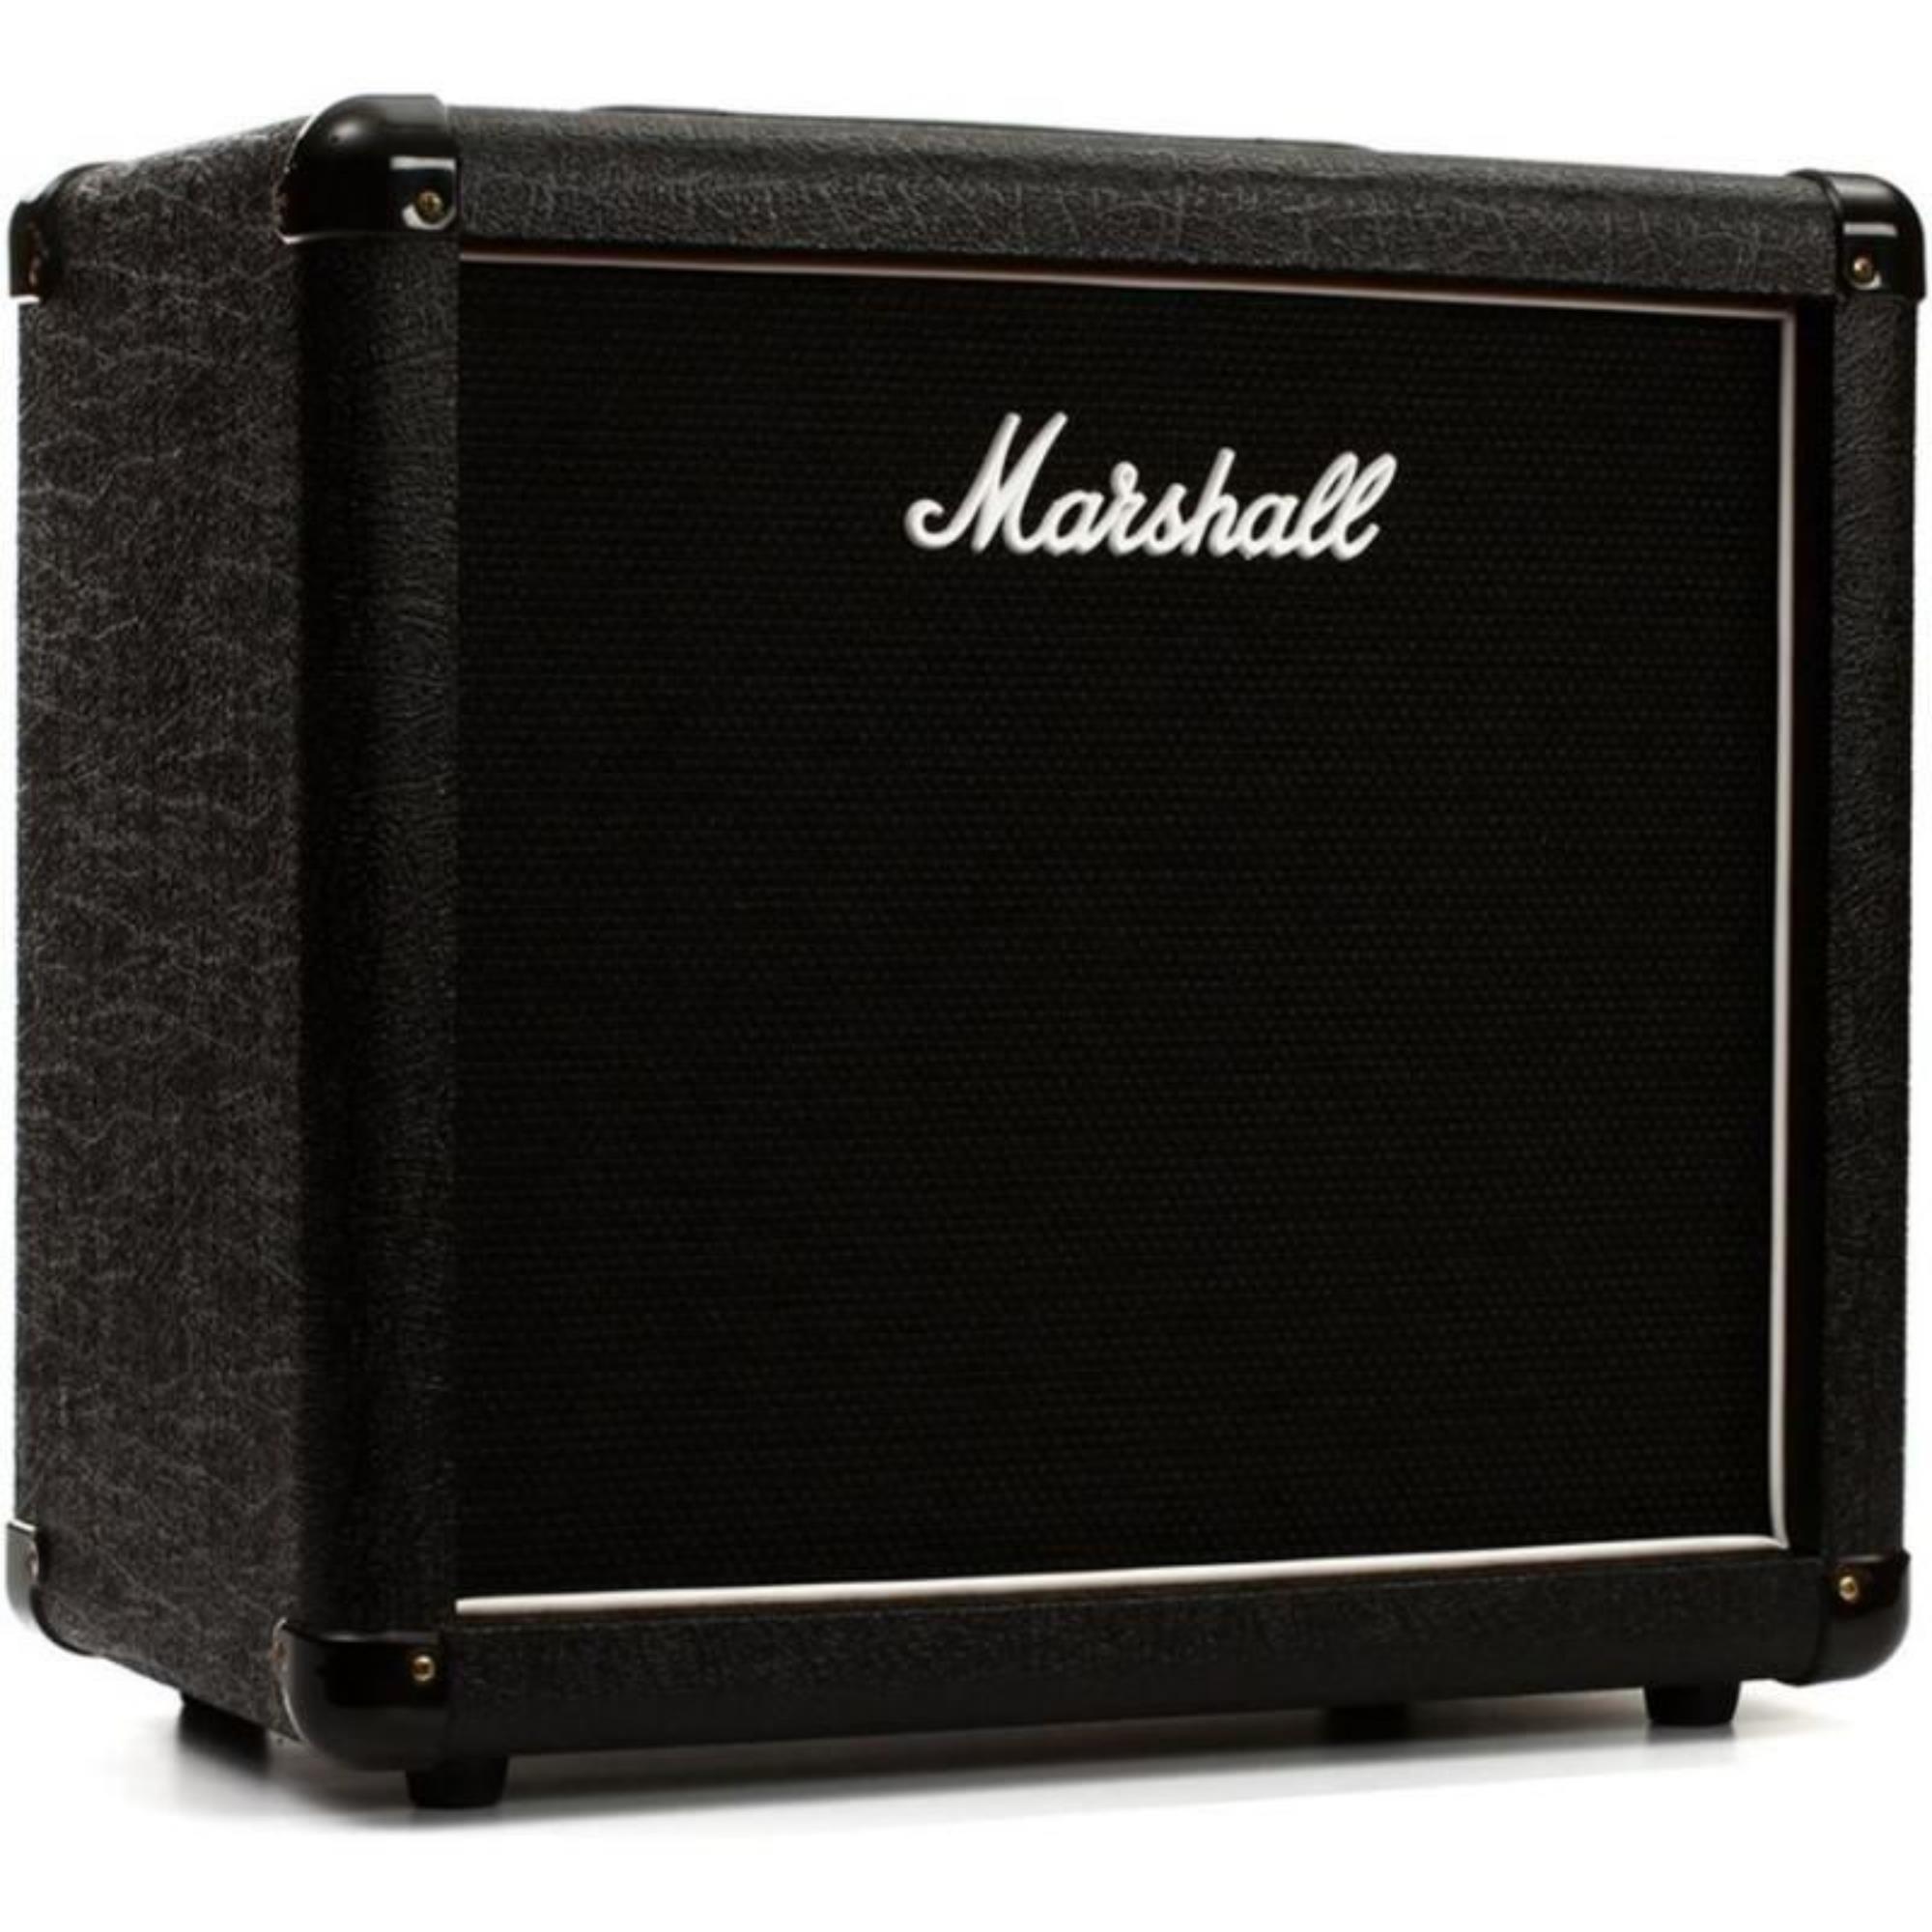 MARSHALL-MX112-cabiner-1x12-sku-24531